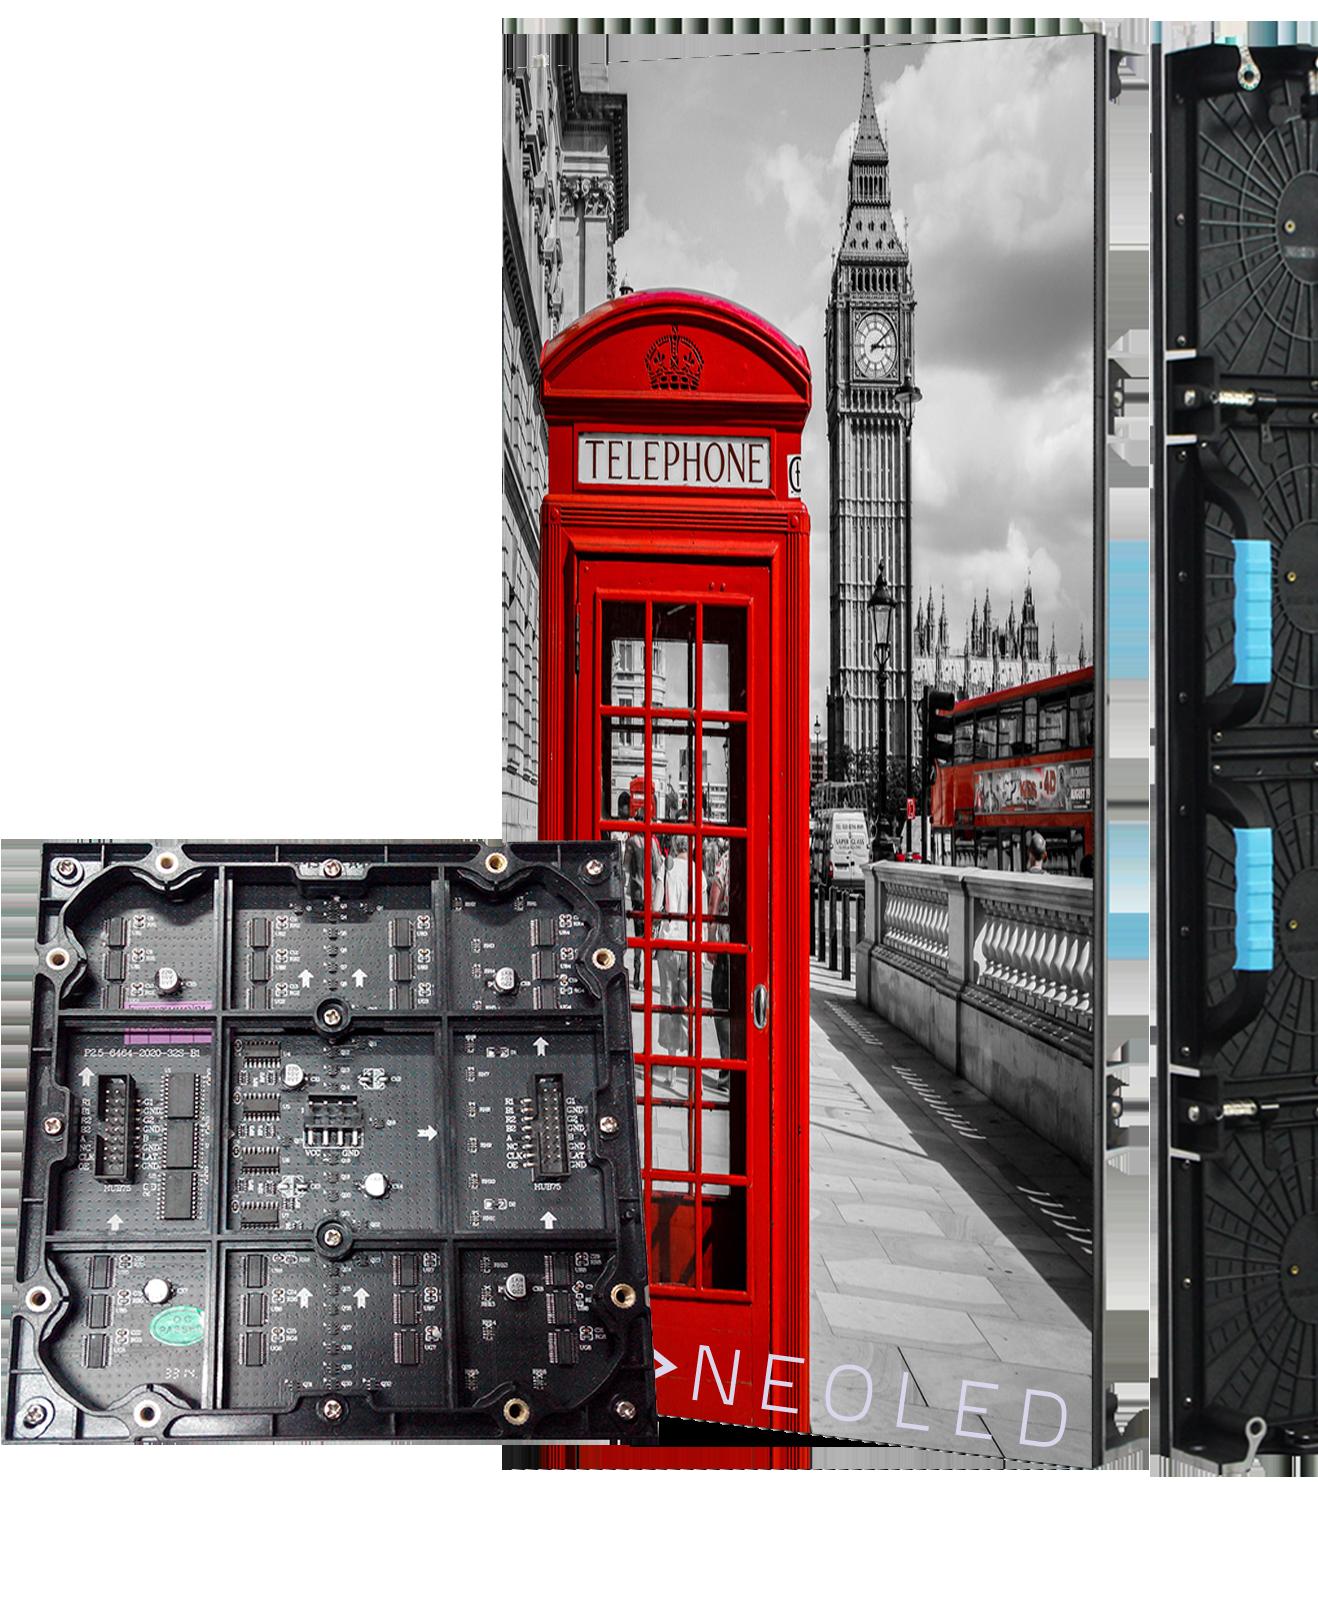 neoled pantallas de led para eventos 1